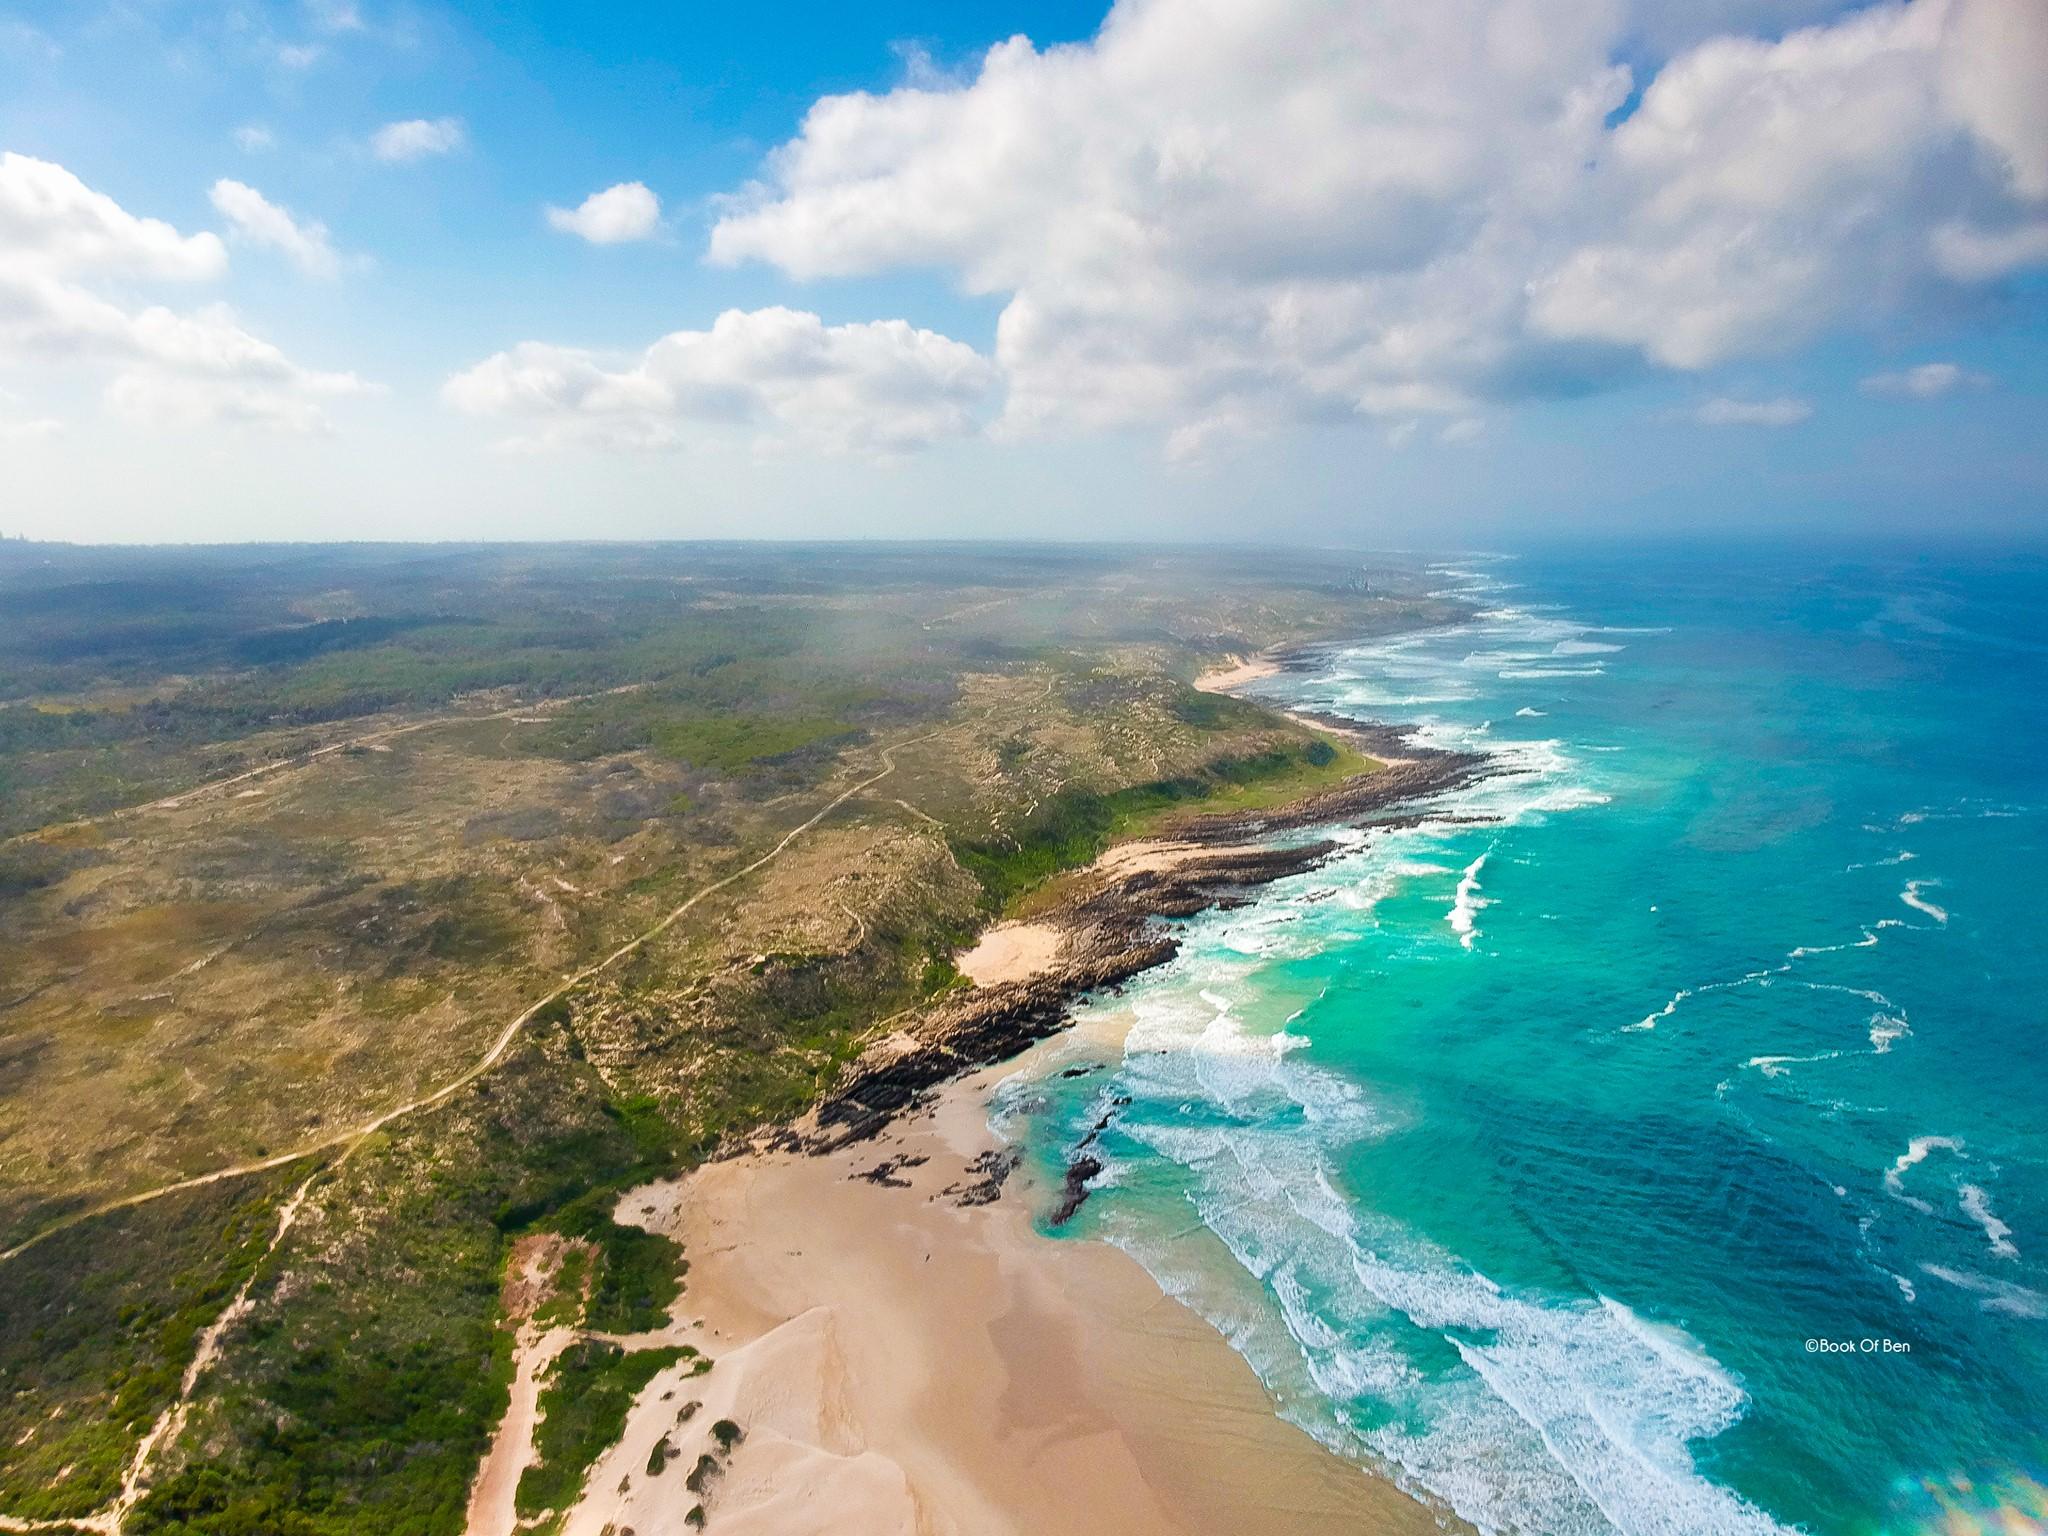 Sardinia Bay, Port Elizabeth